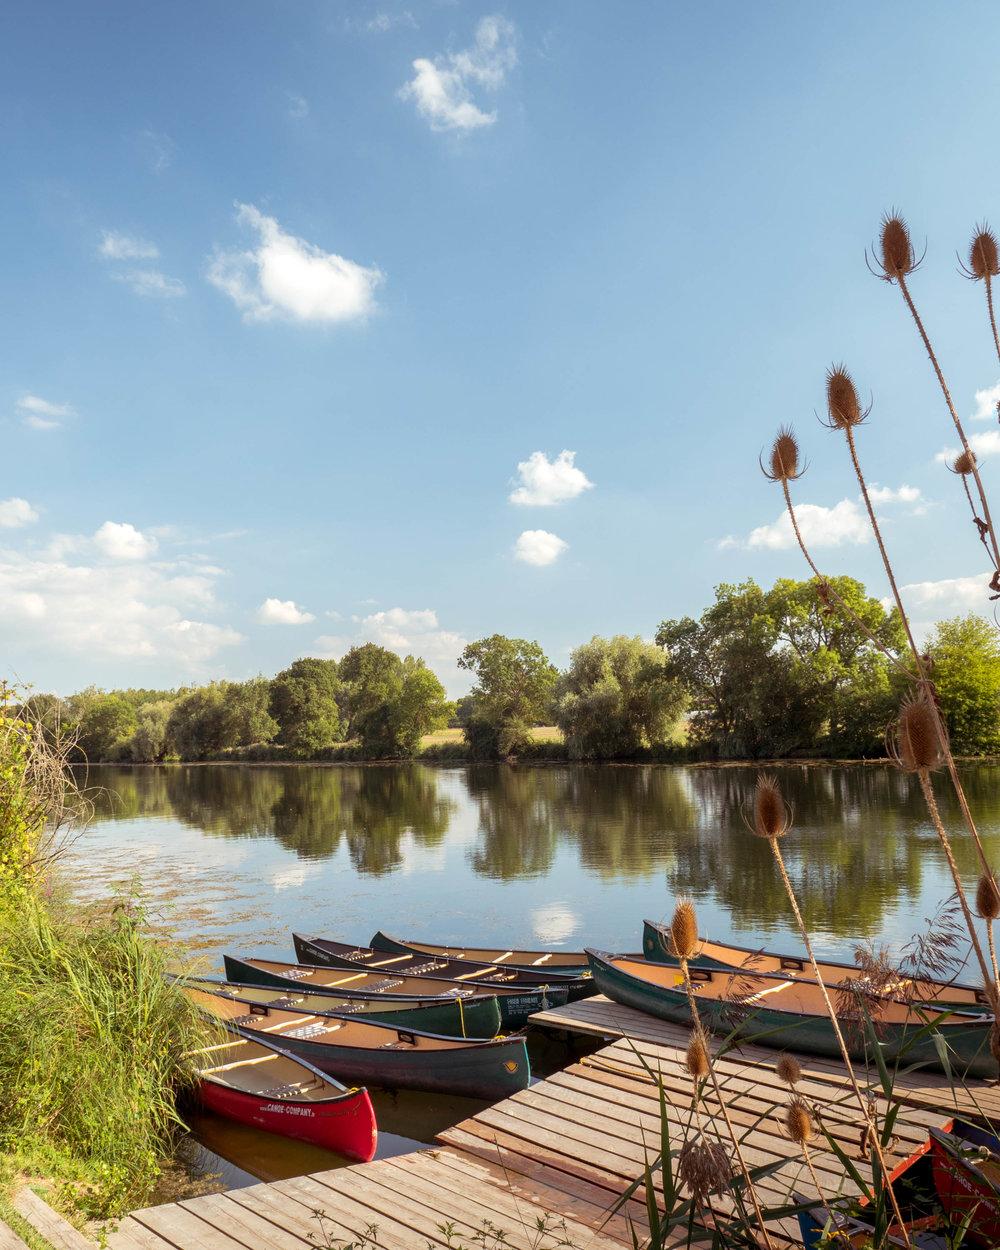 Loire Valley France, Canoe Ride